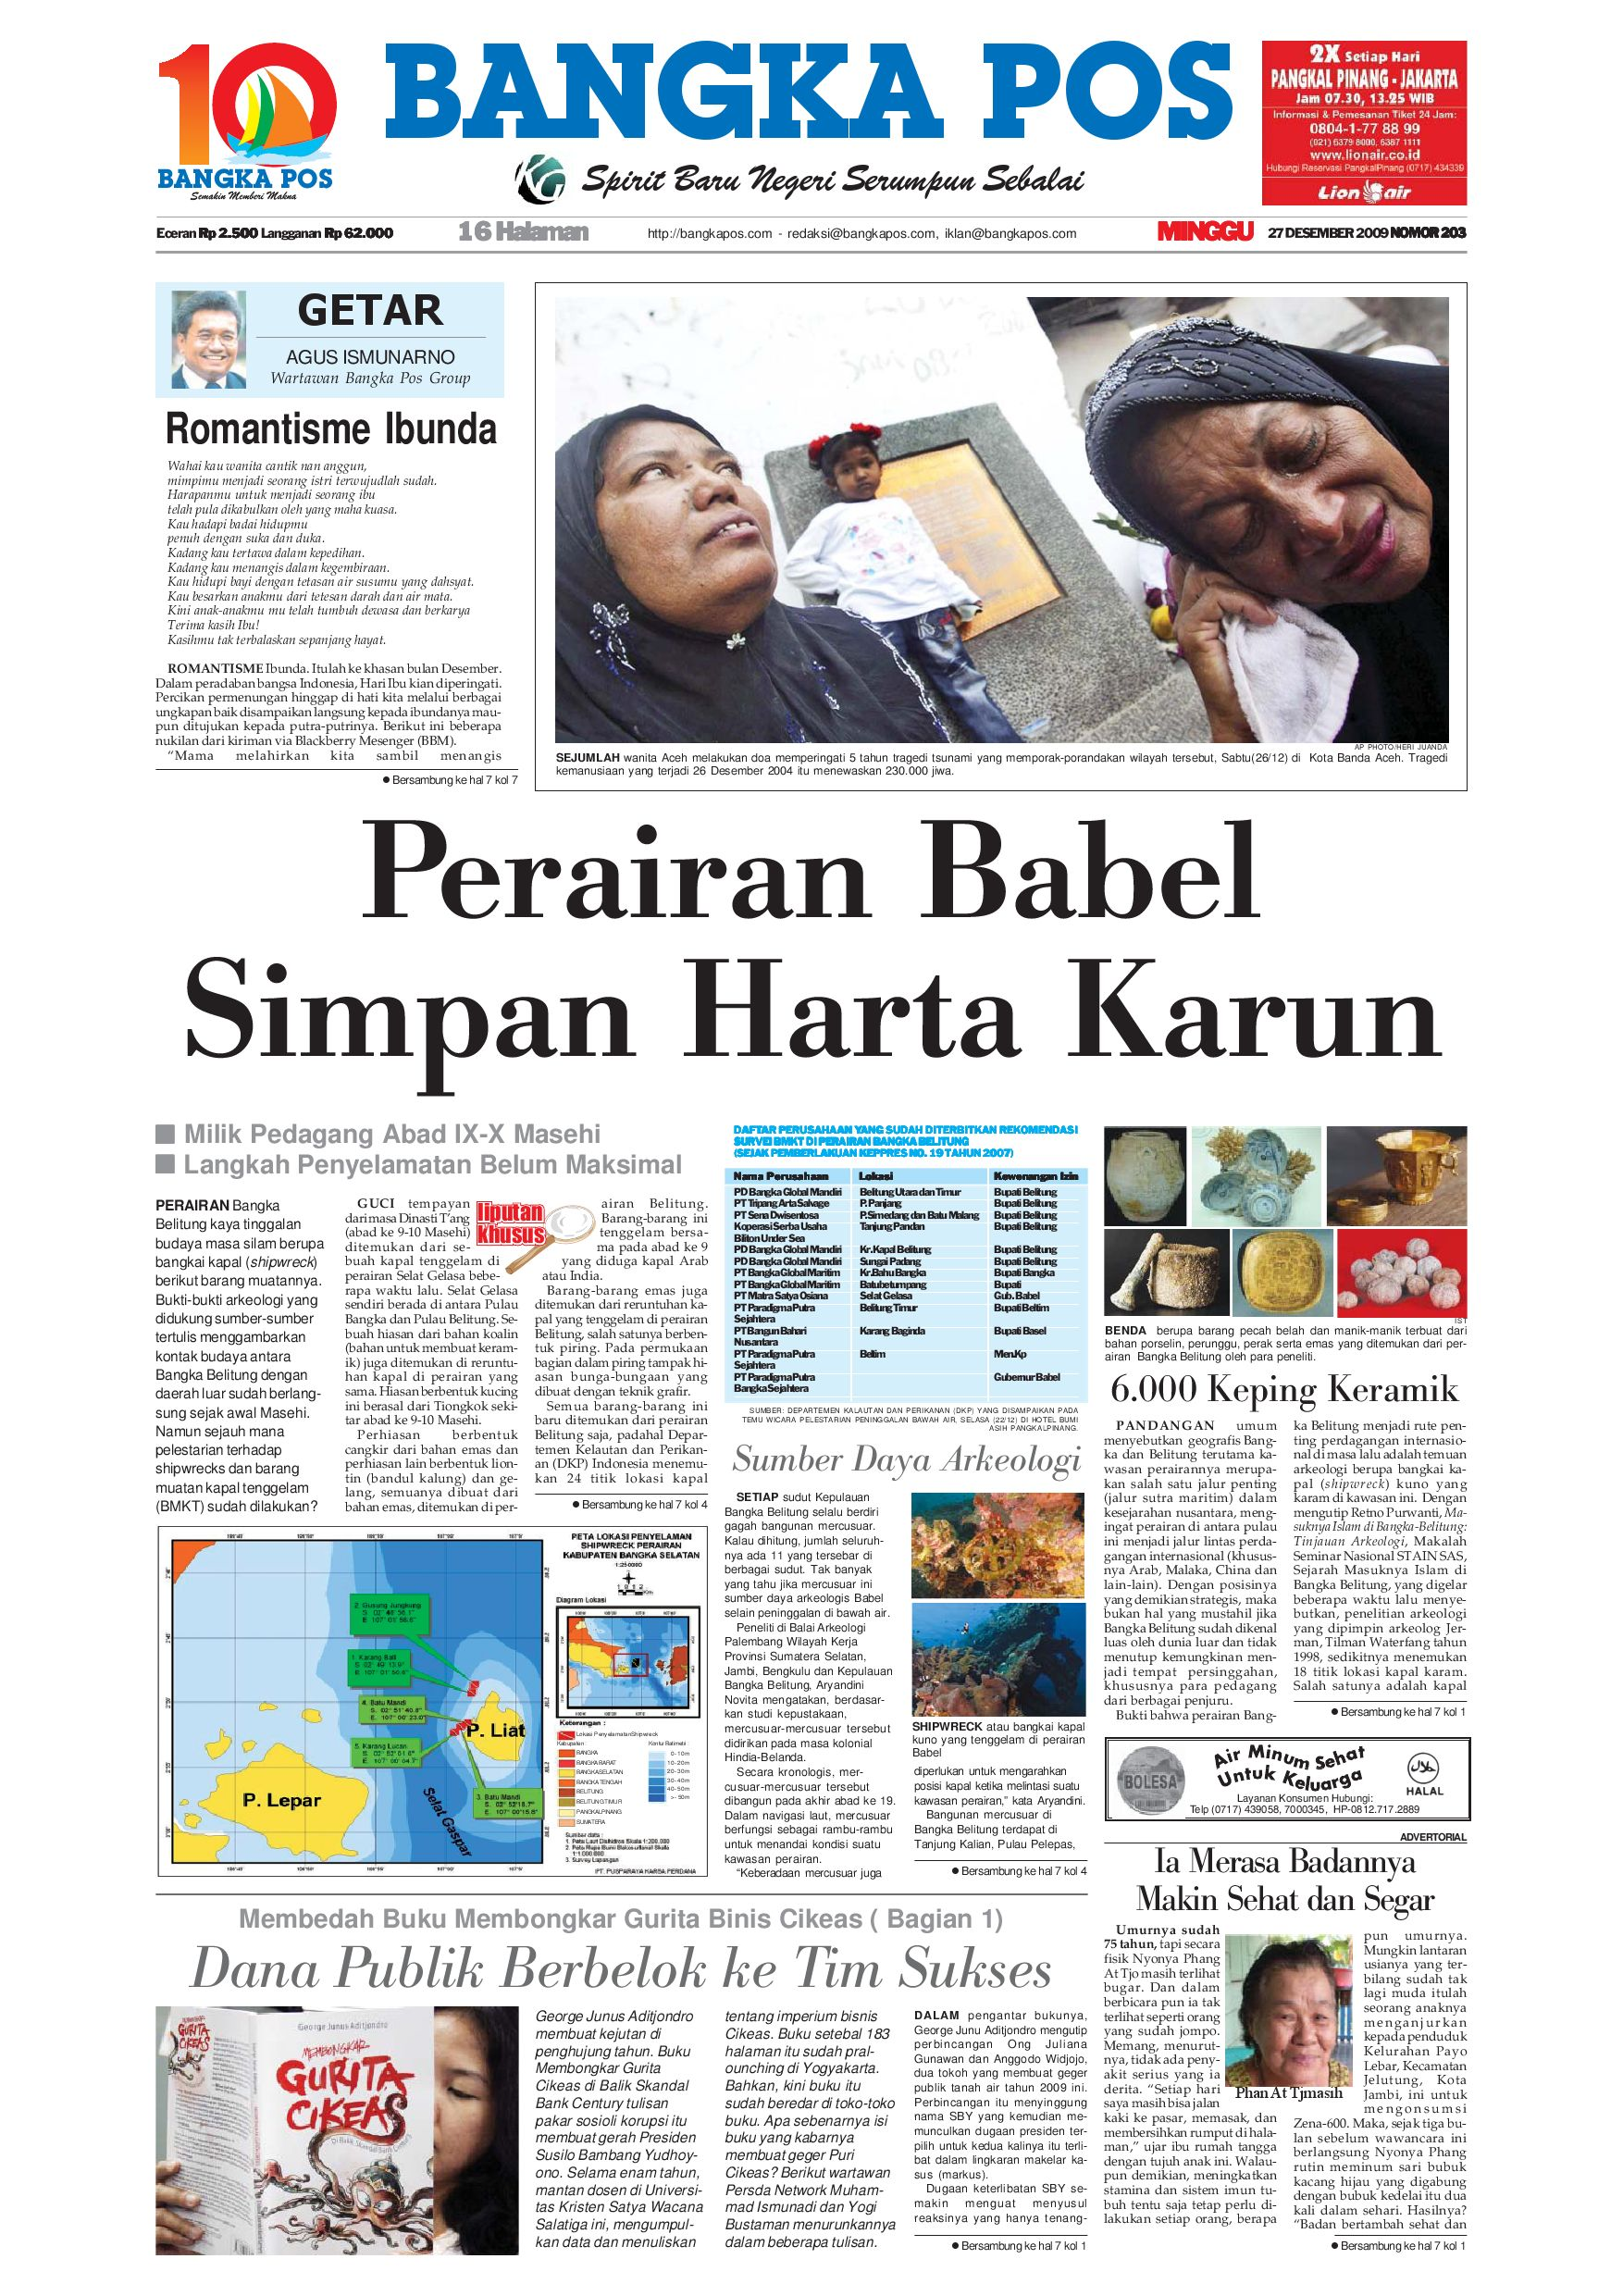 Harian Pagi Bangka Pos Edisi 27 Desember 2009 By Issuu Parcel Makanan Ampamp Kristal Pja 1609